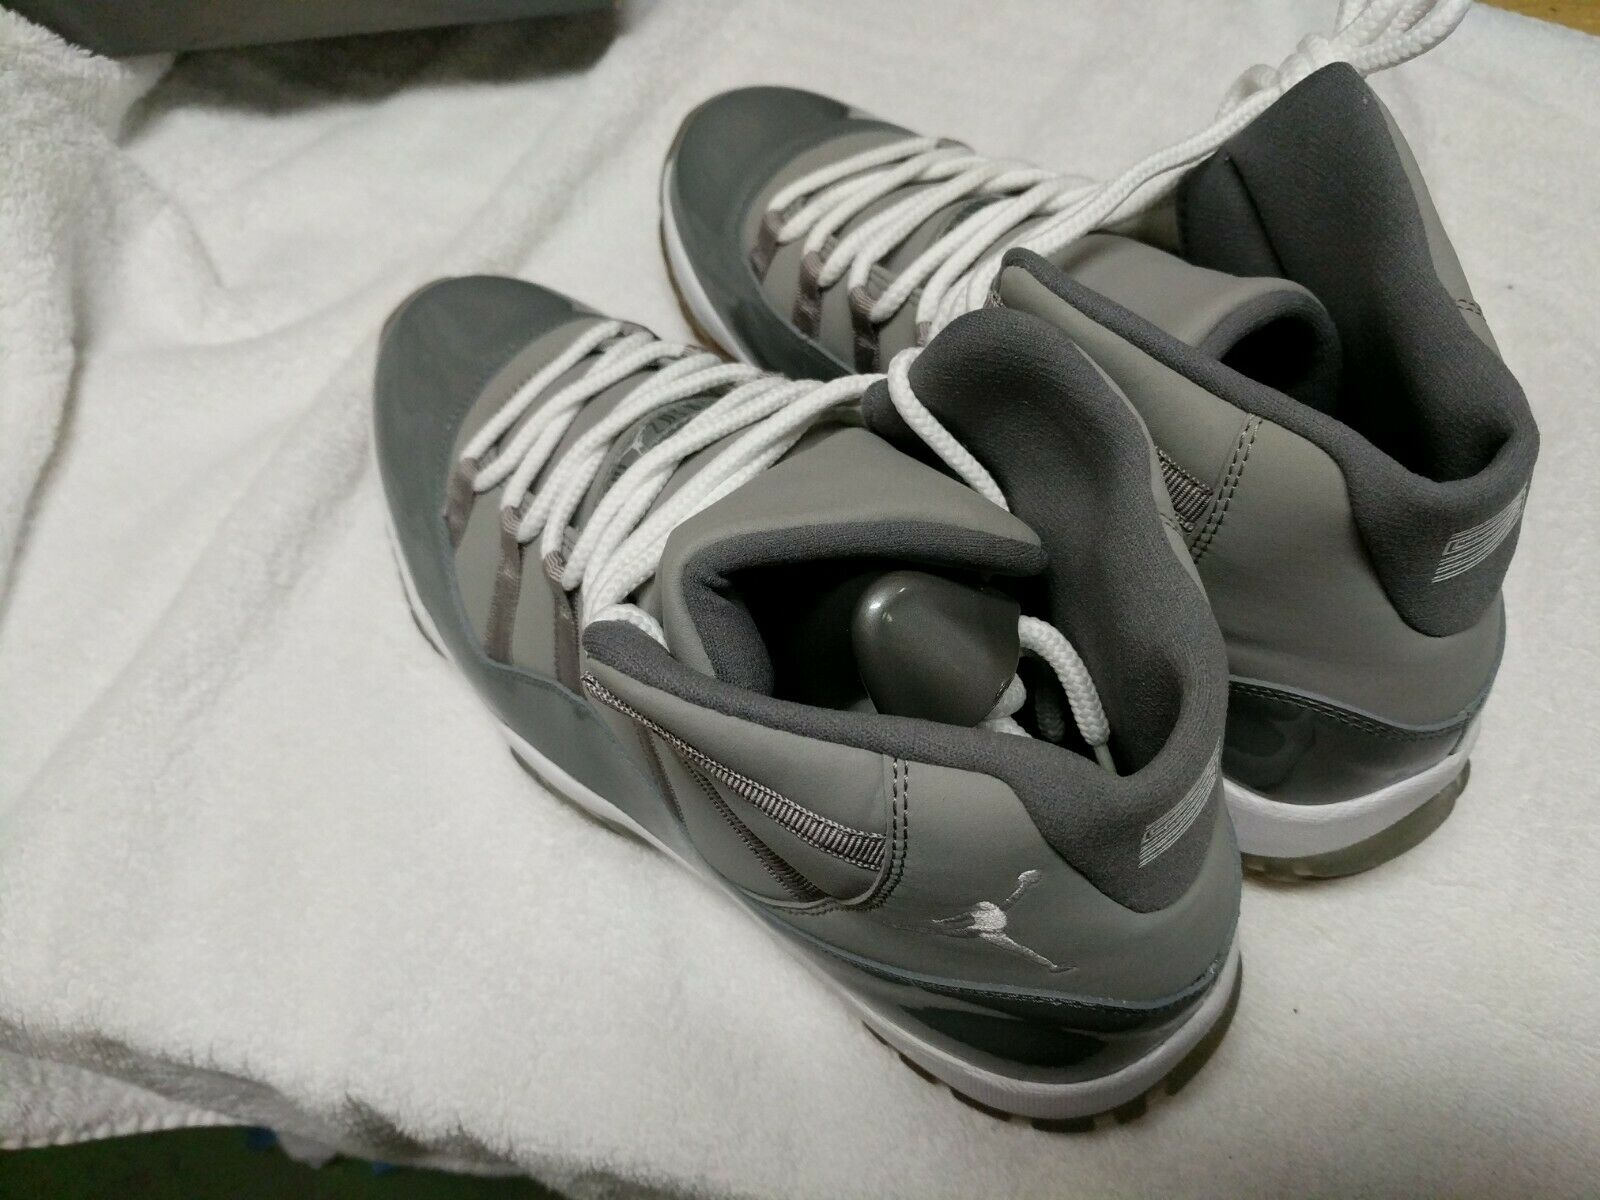 Nike Air Jordan 11 XI Cool Grey 378037-001 Size 12